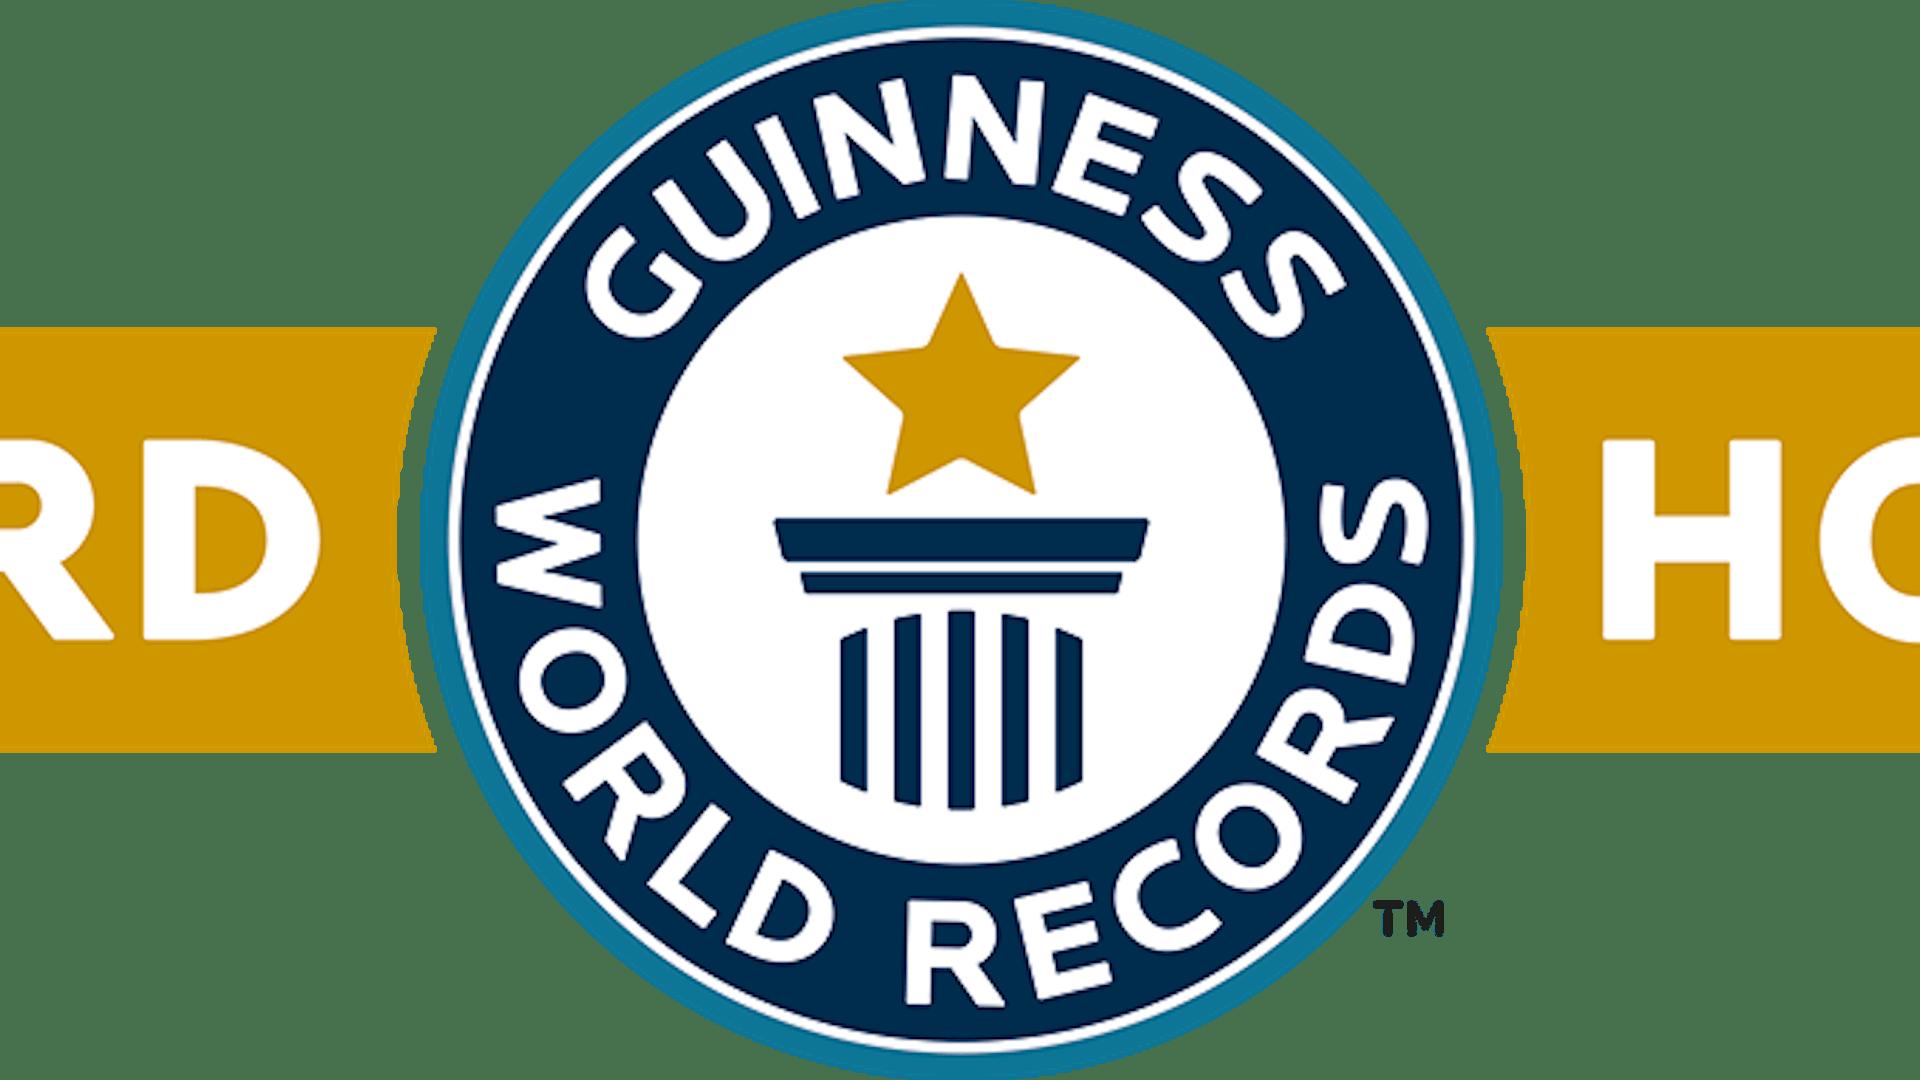 GWR Record Holder Strap Full Colour TM RGB